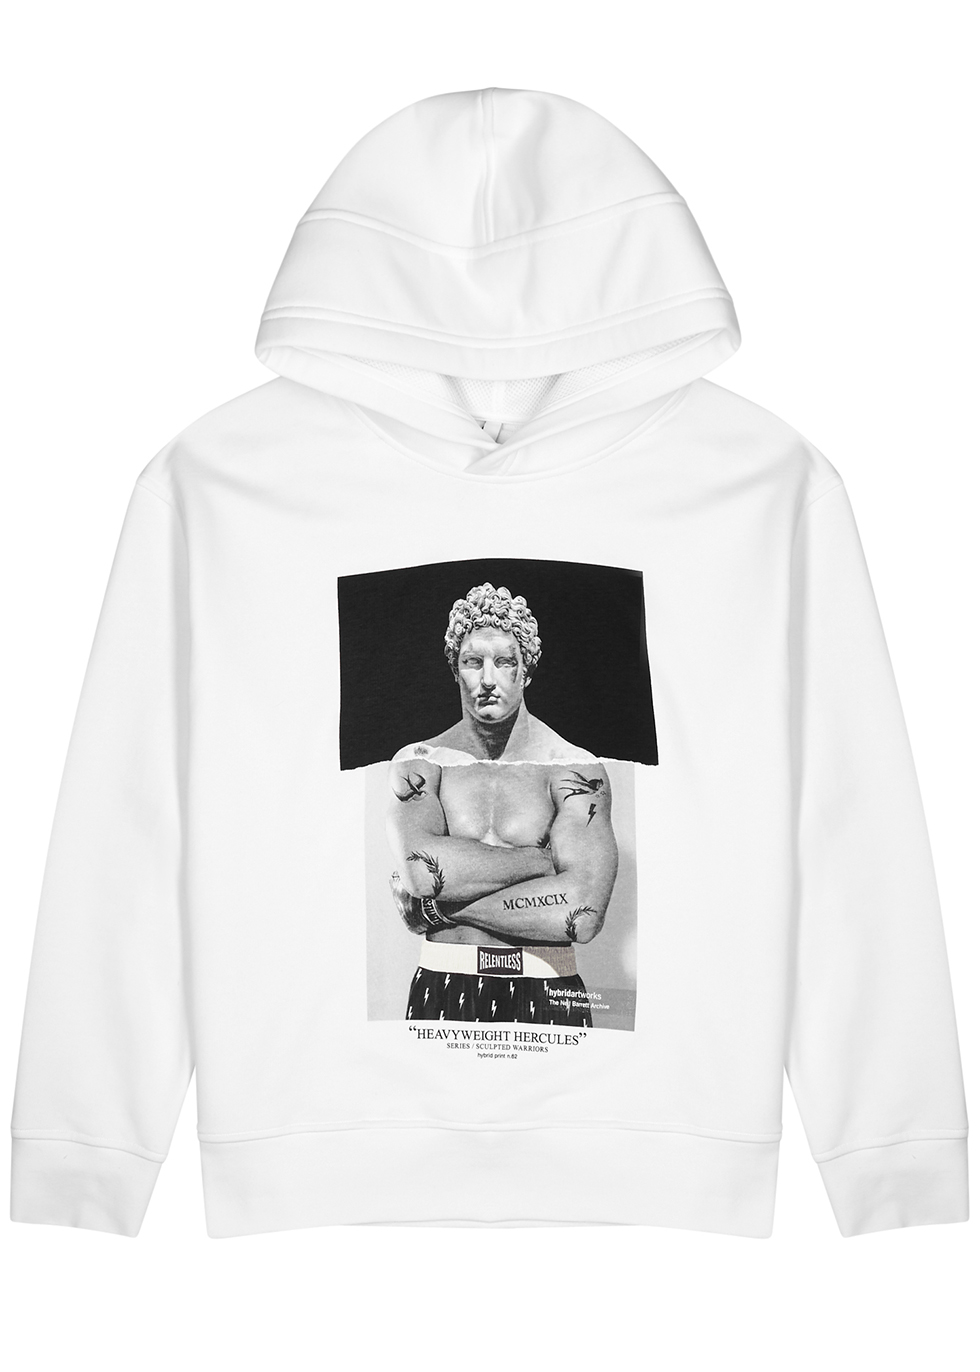 Heavyweight Hercules hooded cotton-blend sweatshirt